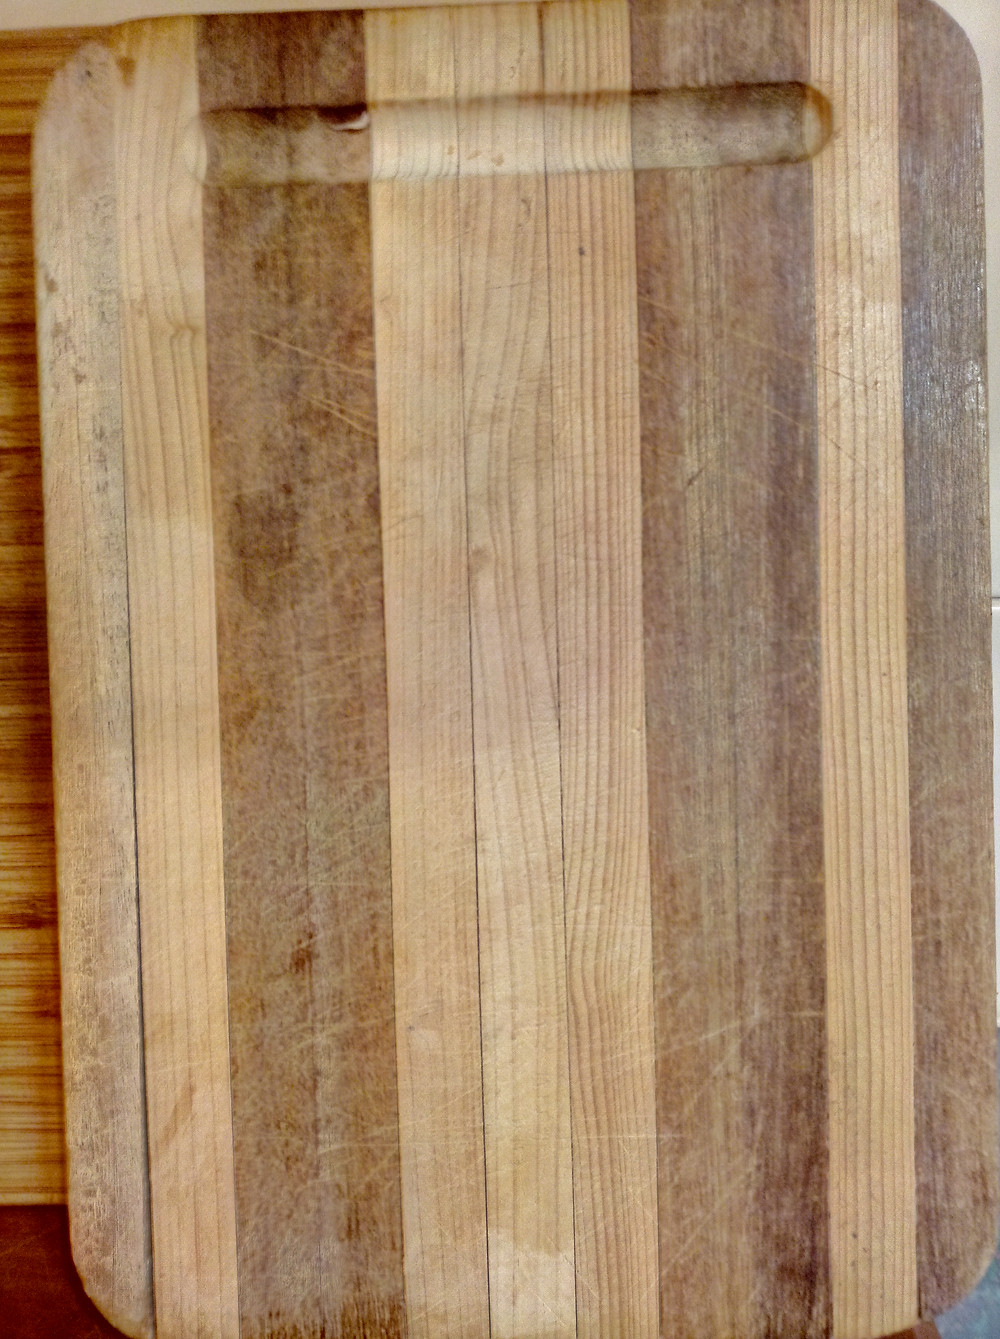 Handmade Bread Board